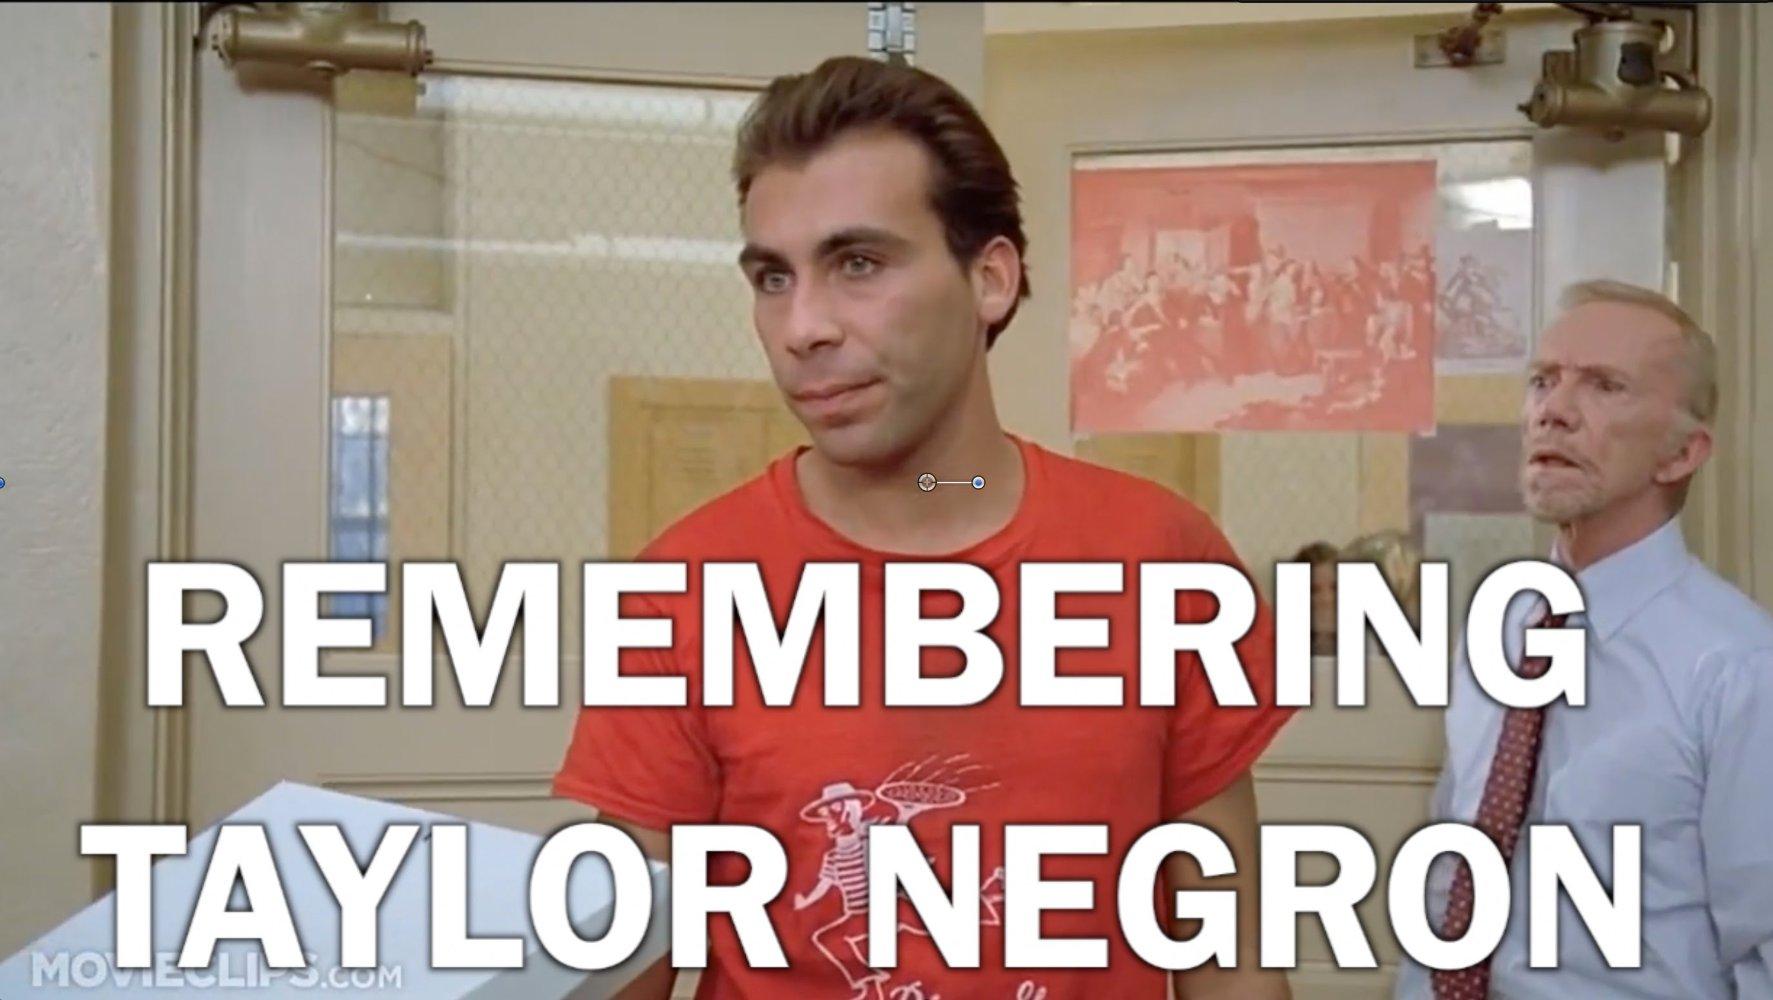 Taylor Negron